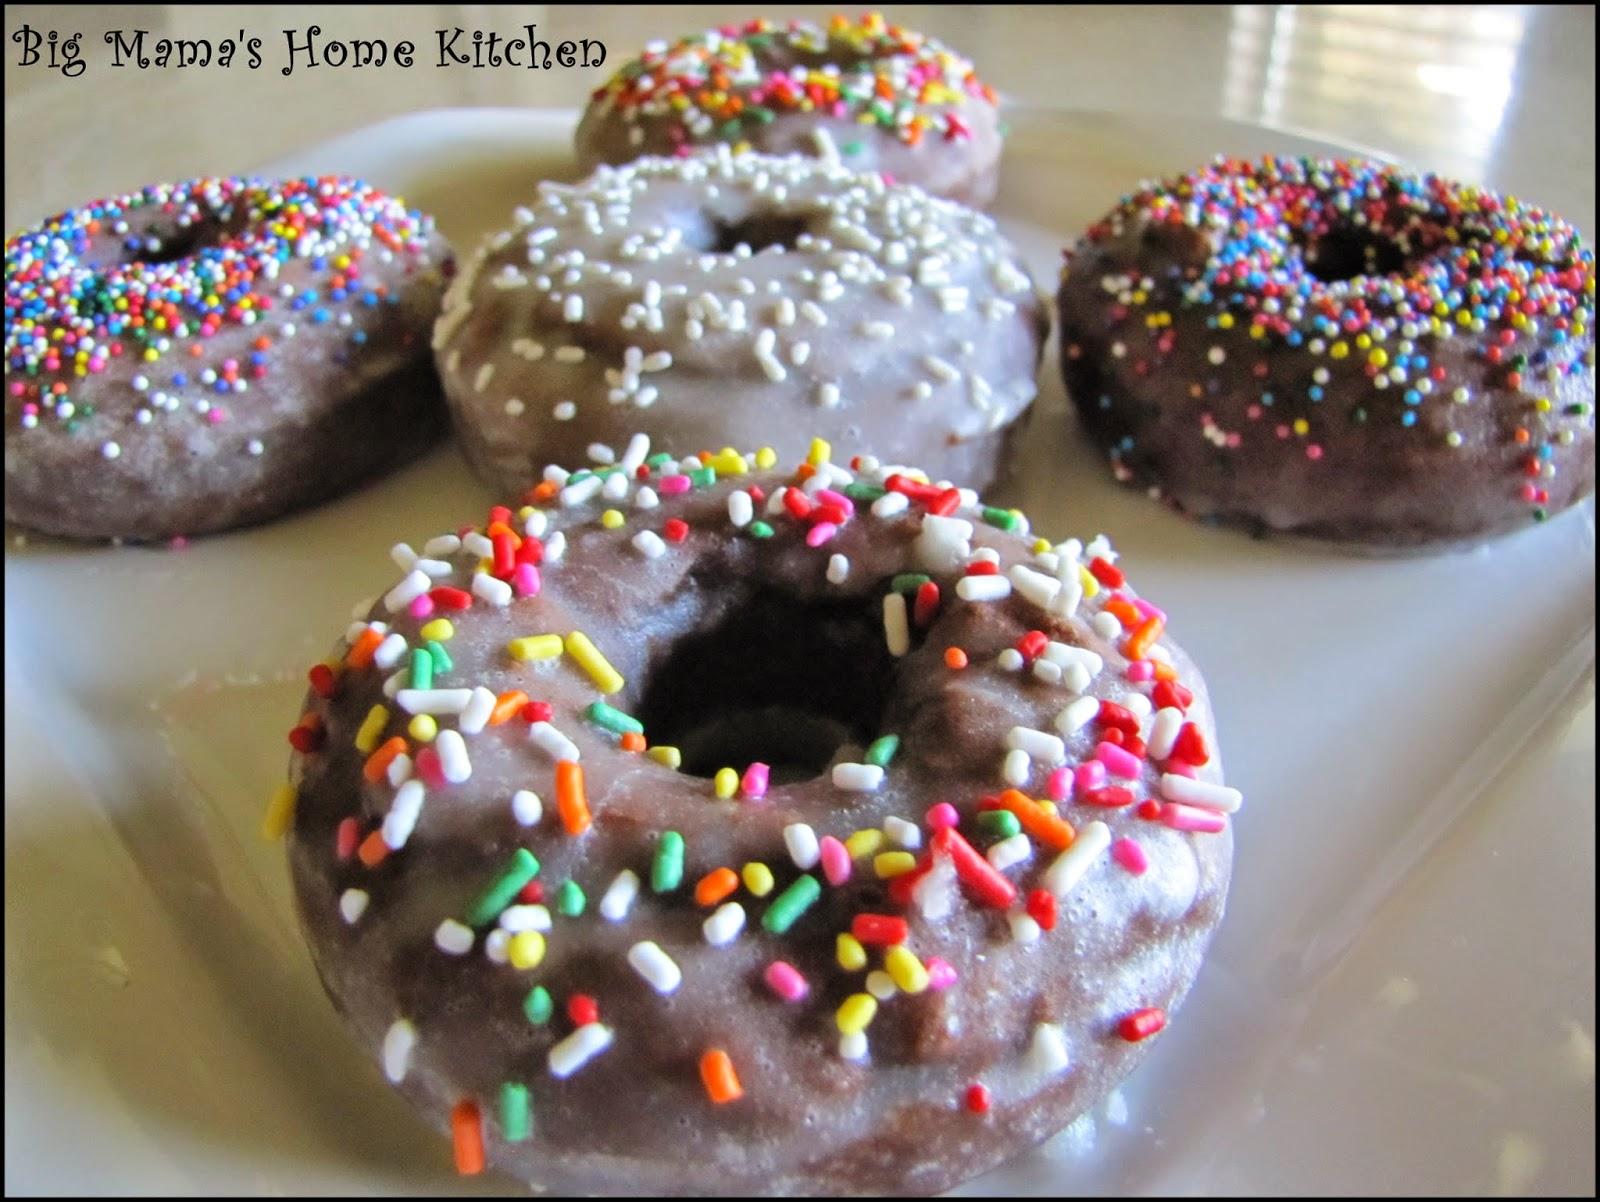 Box cake mix donut recipe